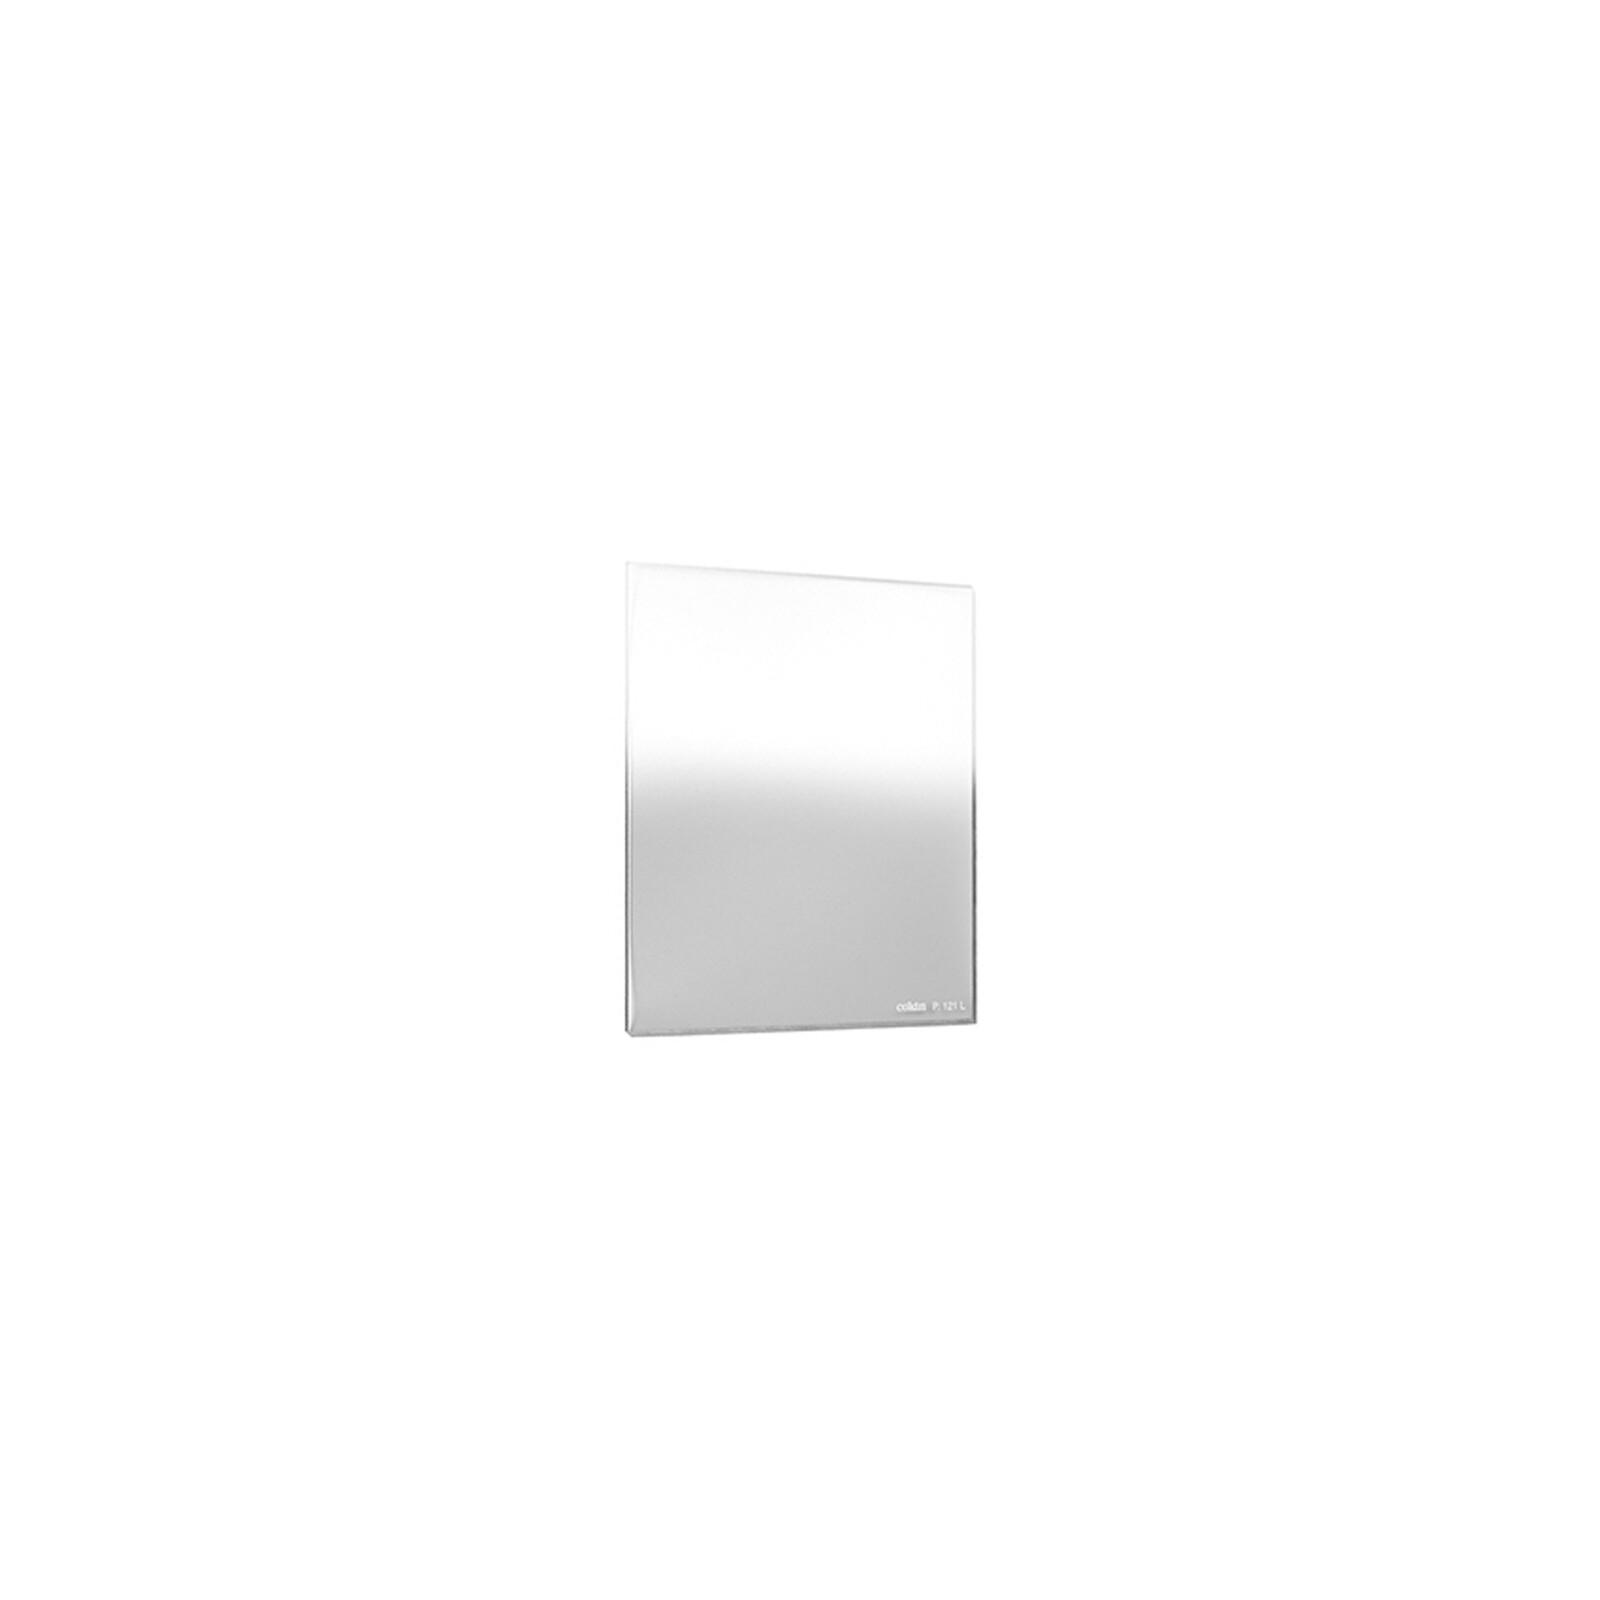 Cokin X121L PRO Verlauf Grau 2 Light